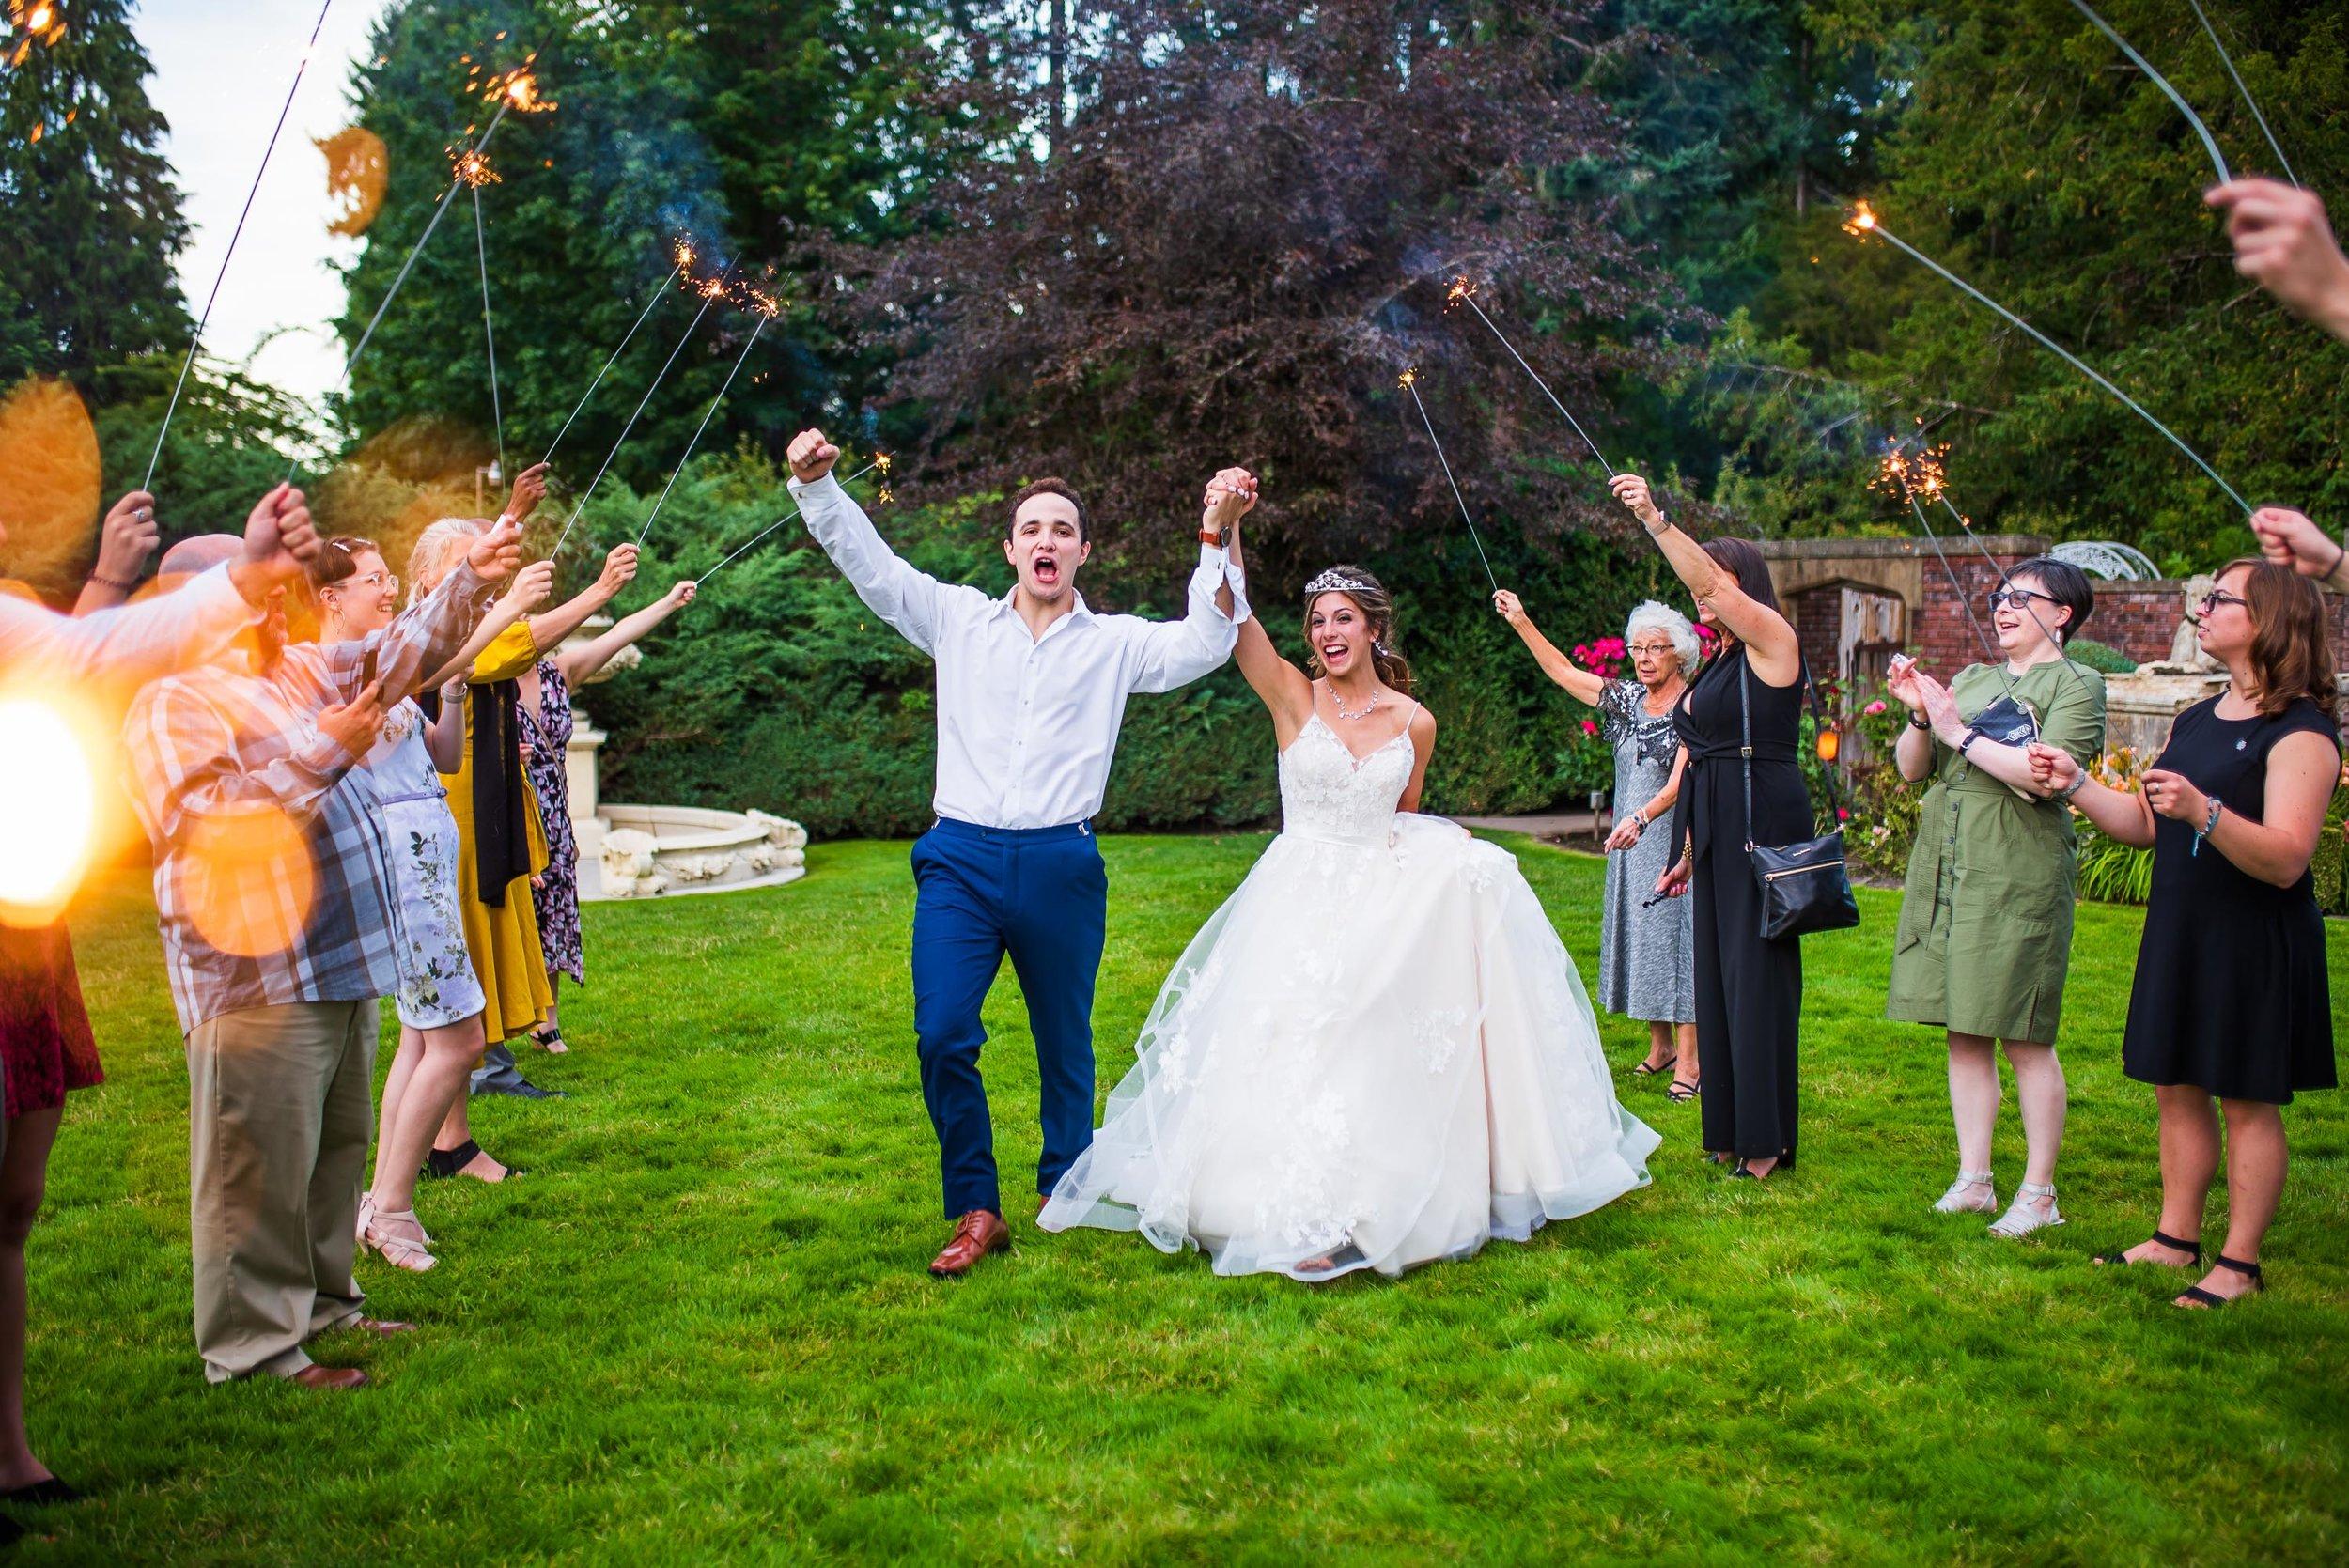 thornewood castle wedding 93.jpg